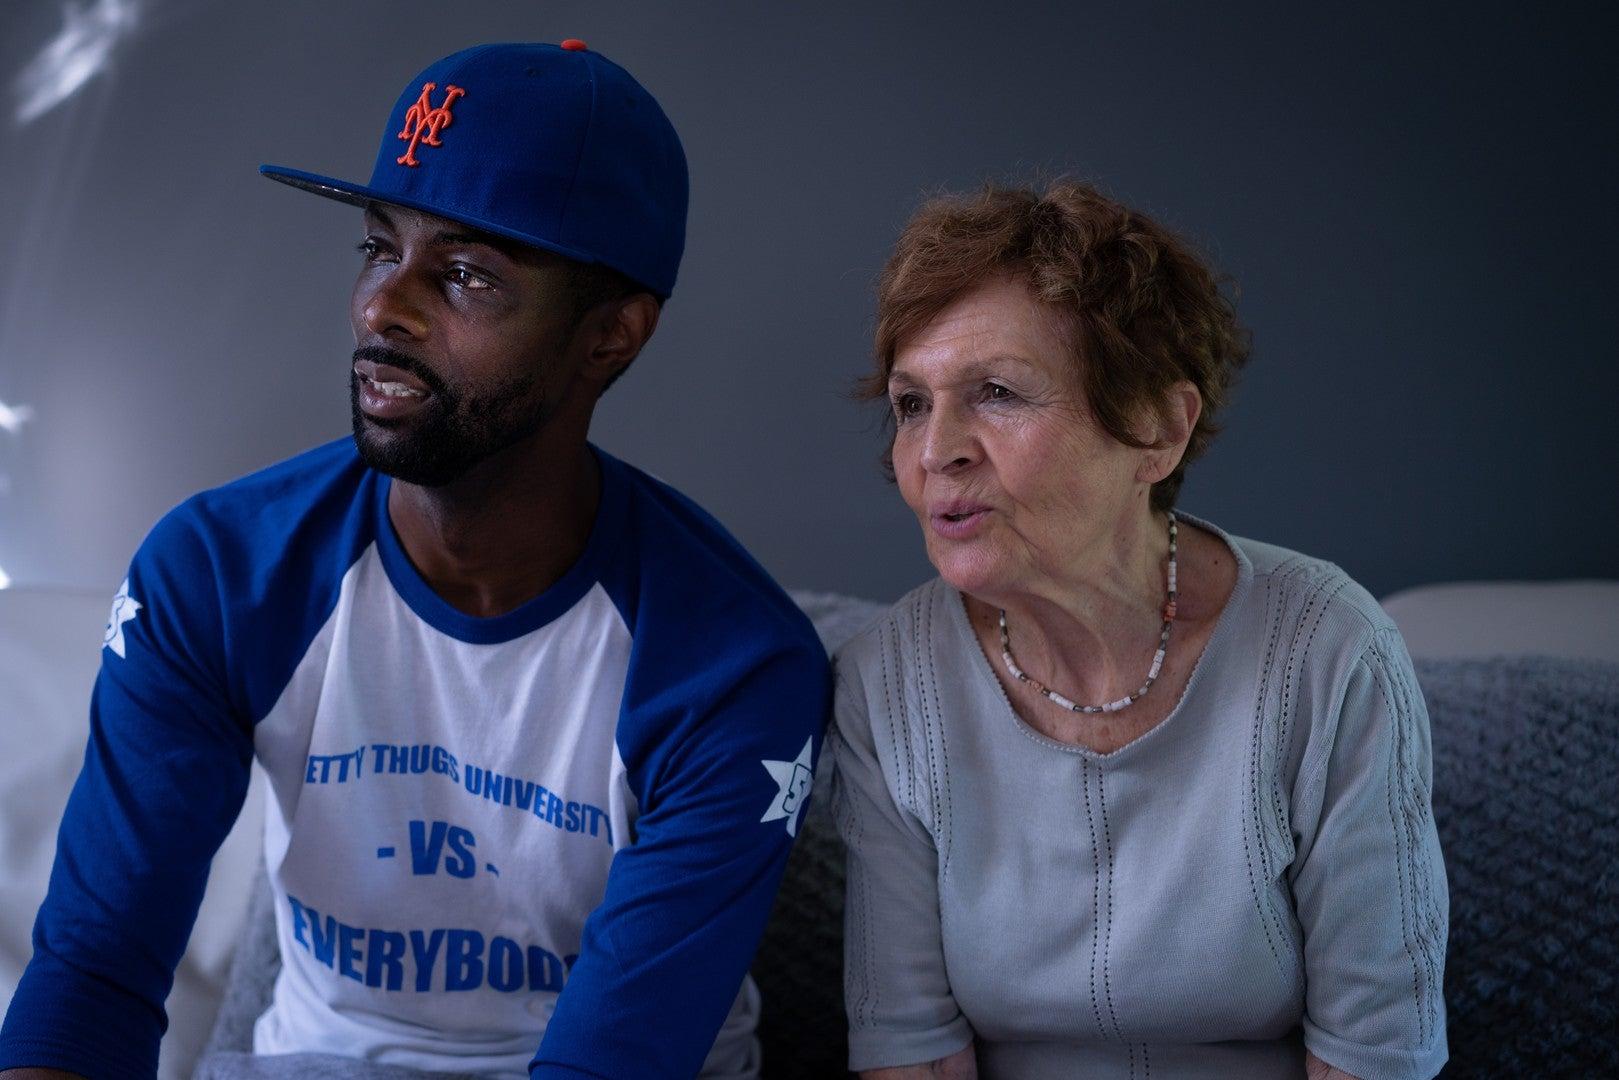 Janine Webber: The Holocaust survivor fighting prejudice through hip hop